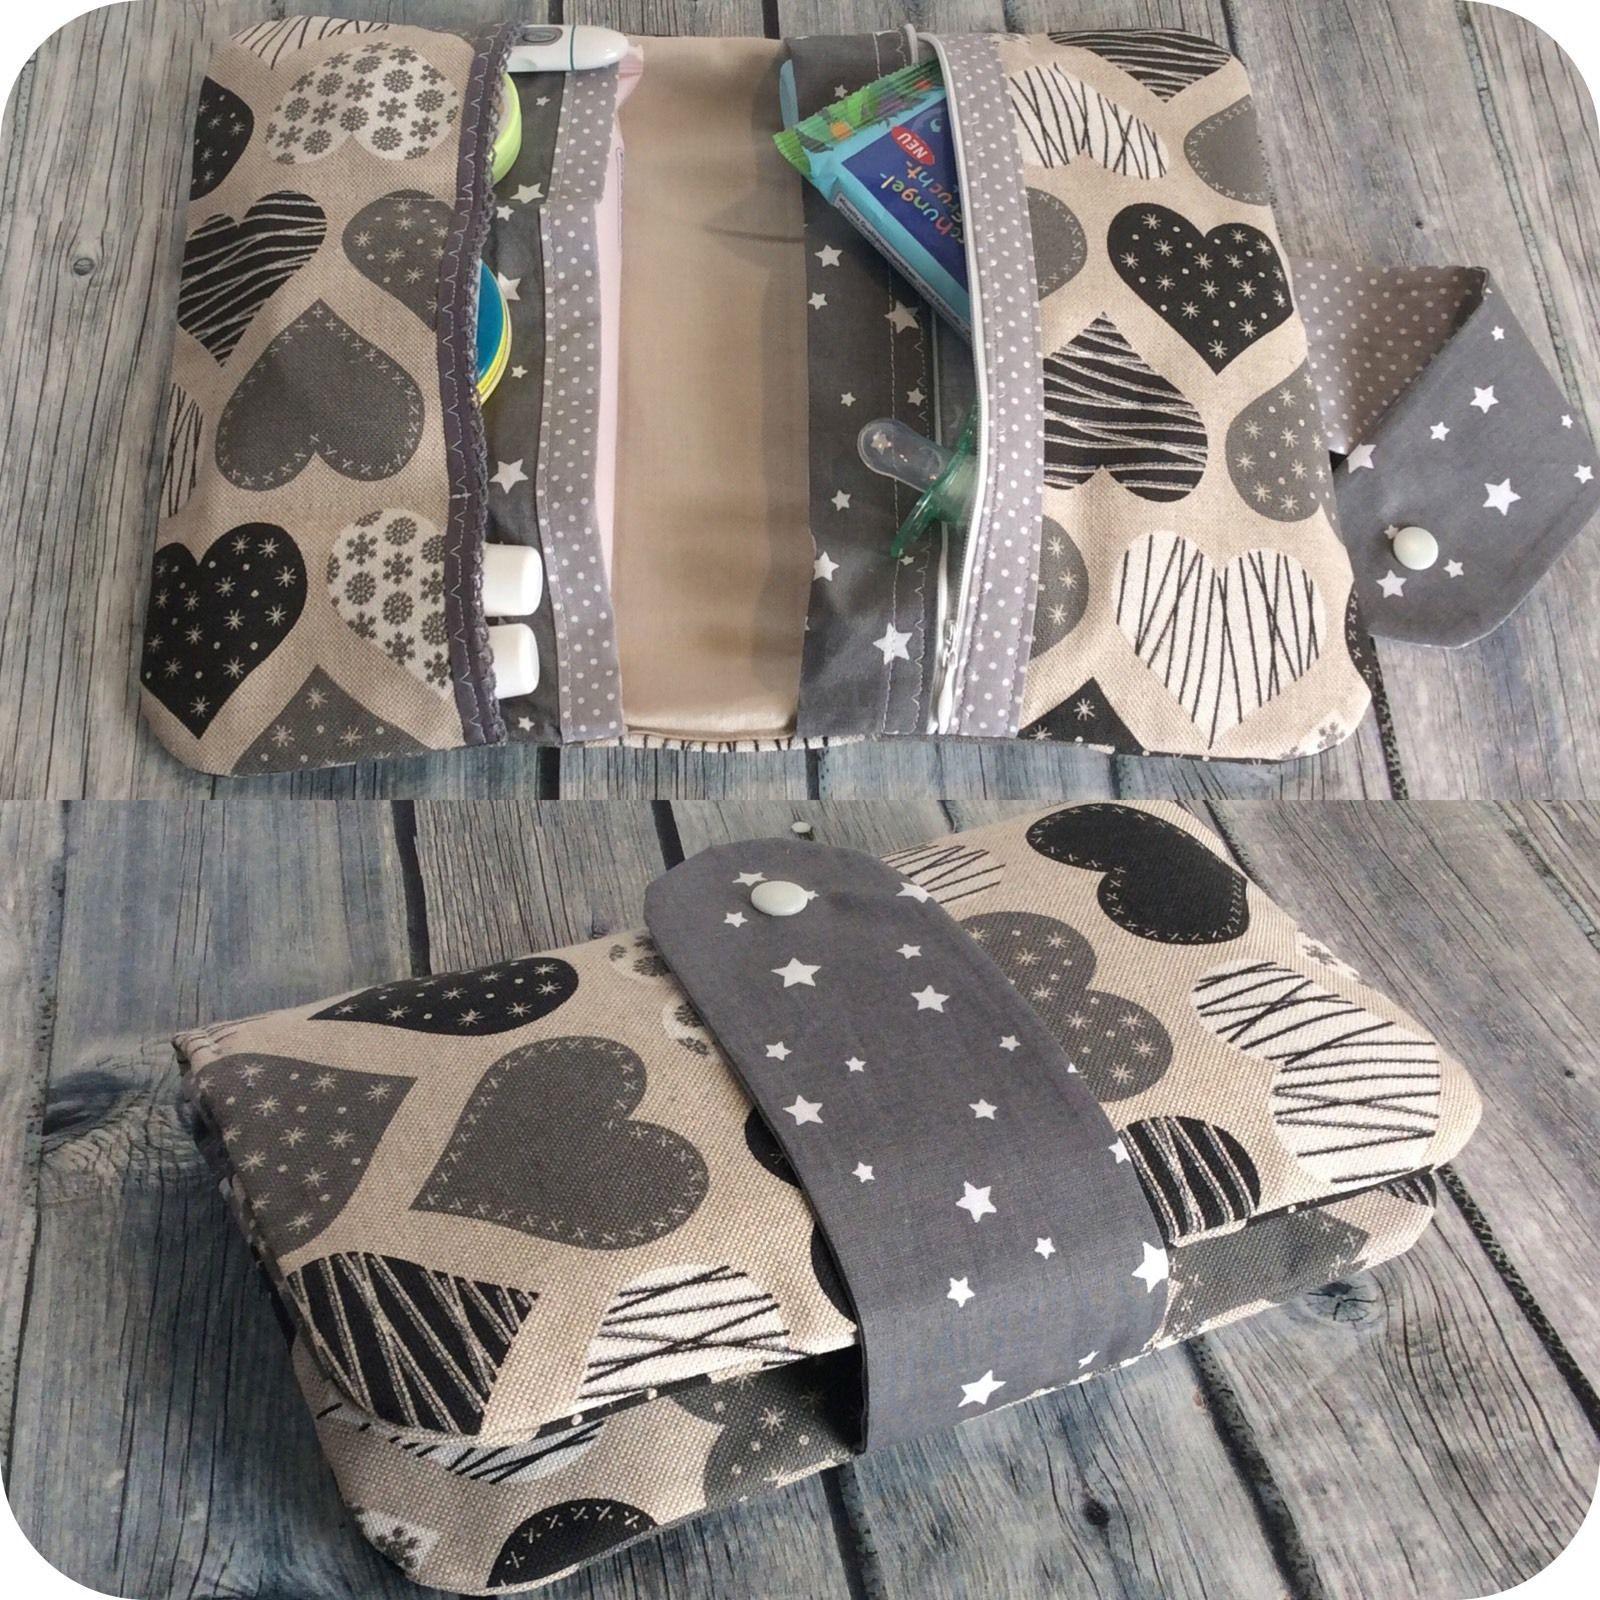 windeltasche xxl reissverschluss sterne herzen wickeltasche unikat geschenk baby windeltasche. Black Bedroom Furniture Sets. Home Design Ideas